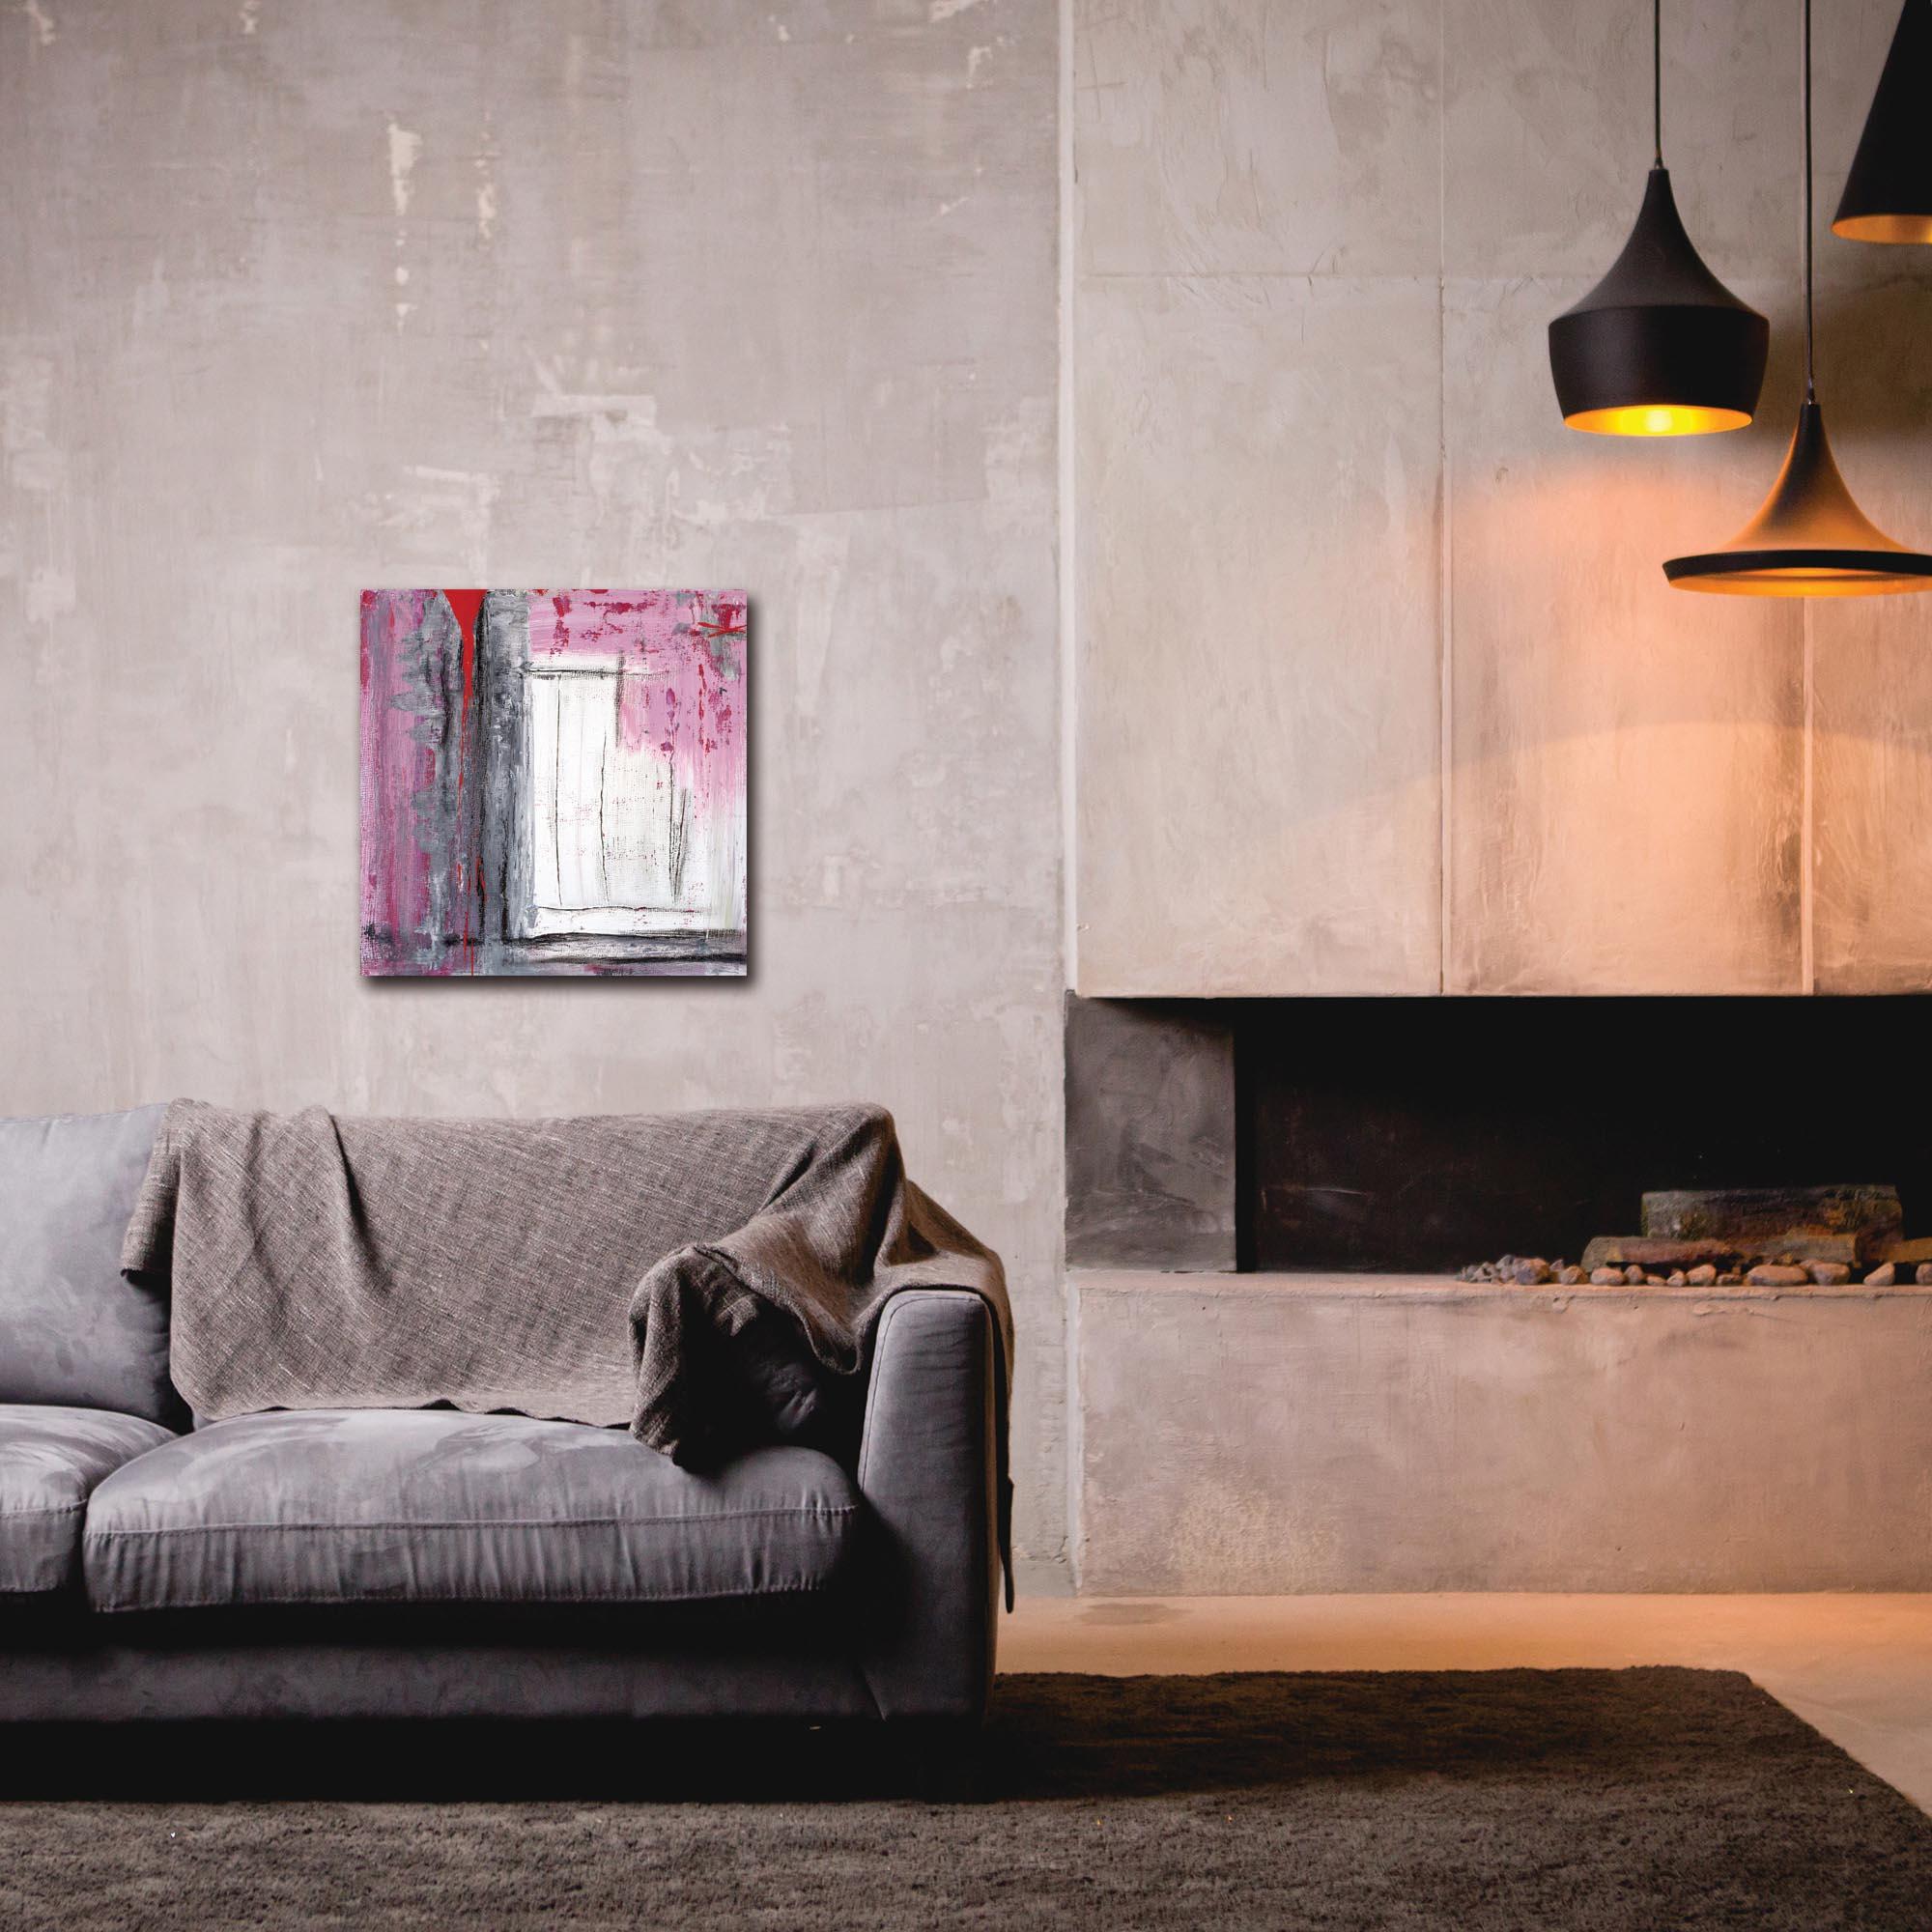 Abstract Wall Art 'Urban Life 5' - Urban Decor on Metal or Plexiglass - Lifestyle View